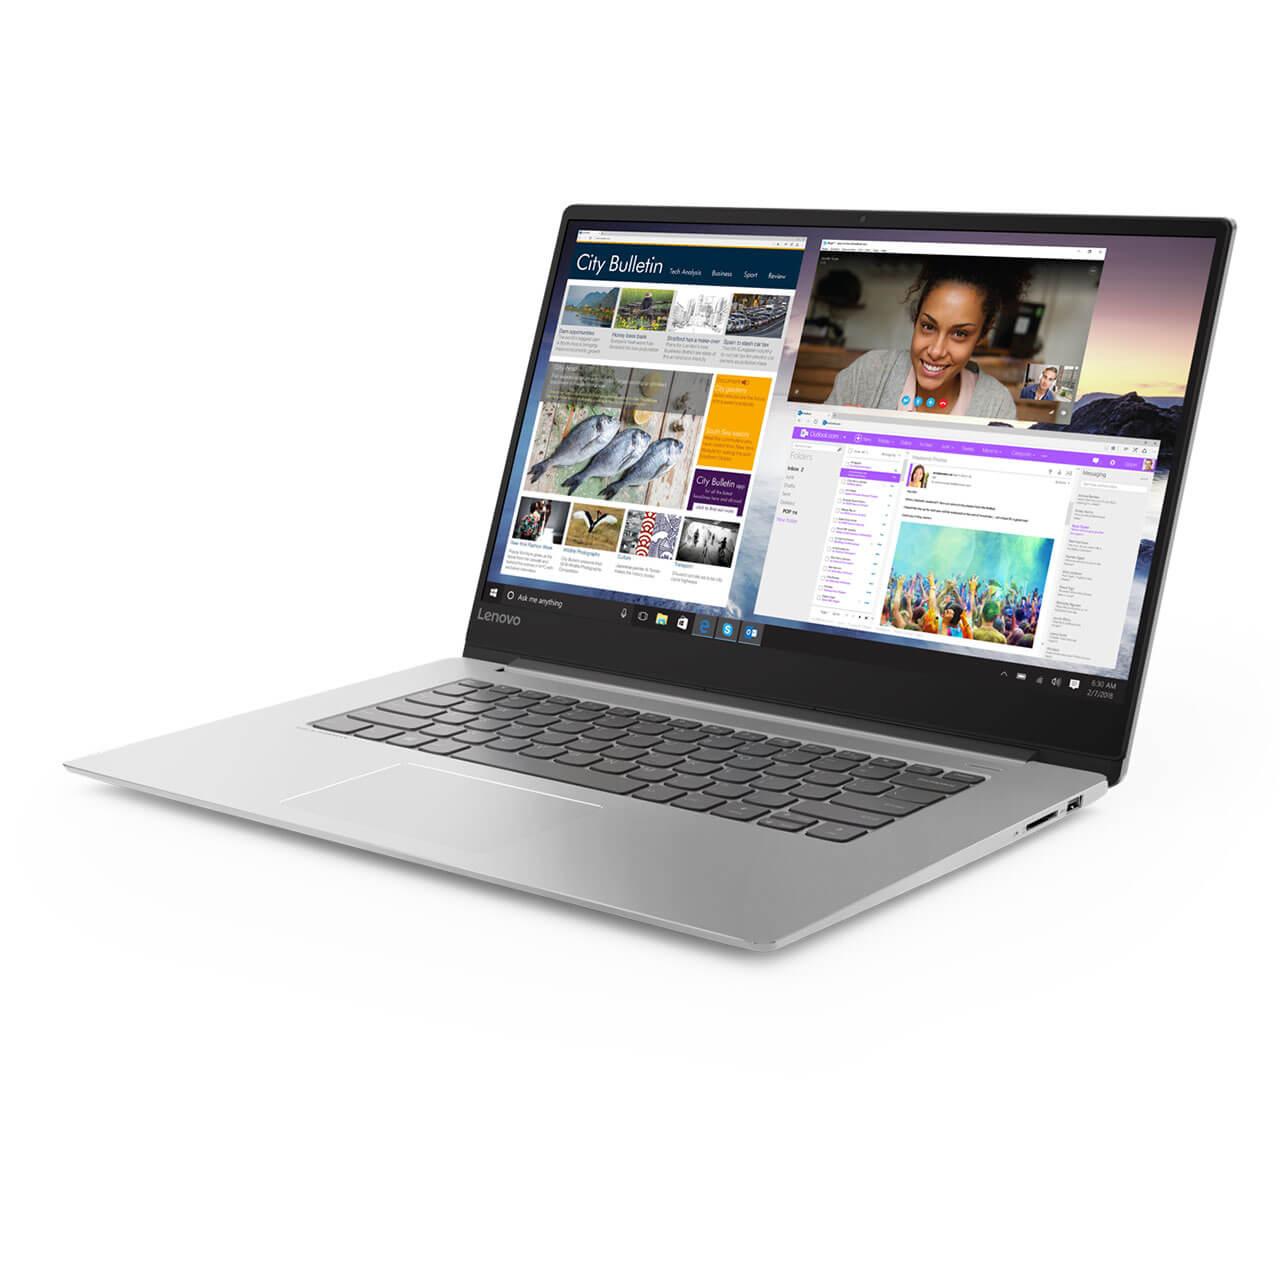 "Lenovo Ideapad 530S, 15.6"", i7-8550U, 8 GB RAM, 512GB SSD, Win 10 Home 64 0"